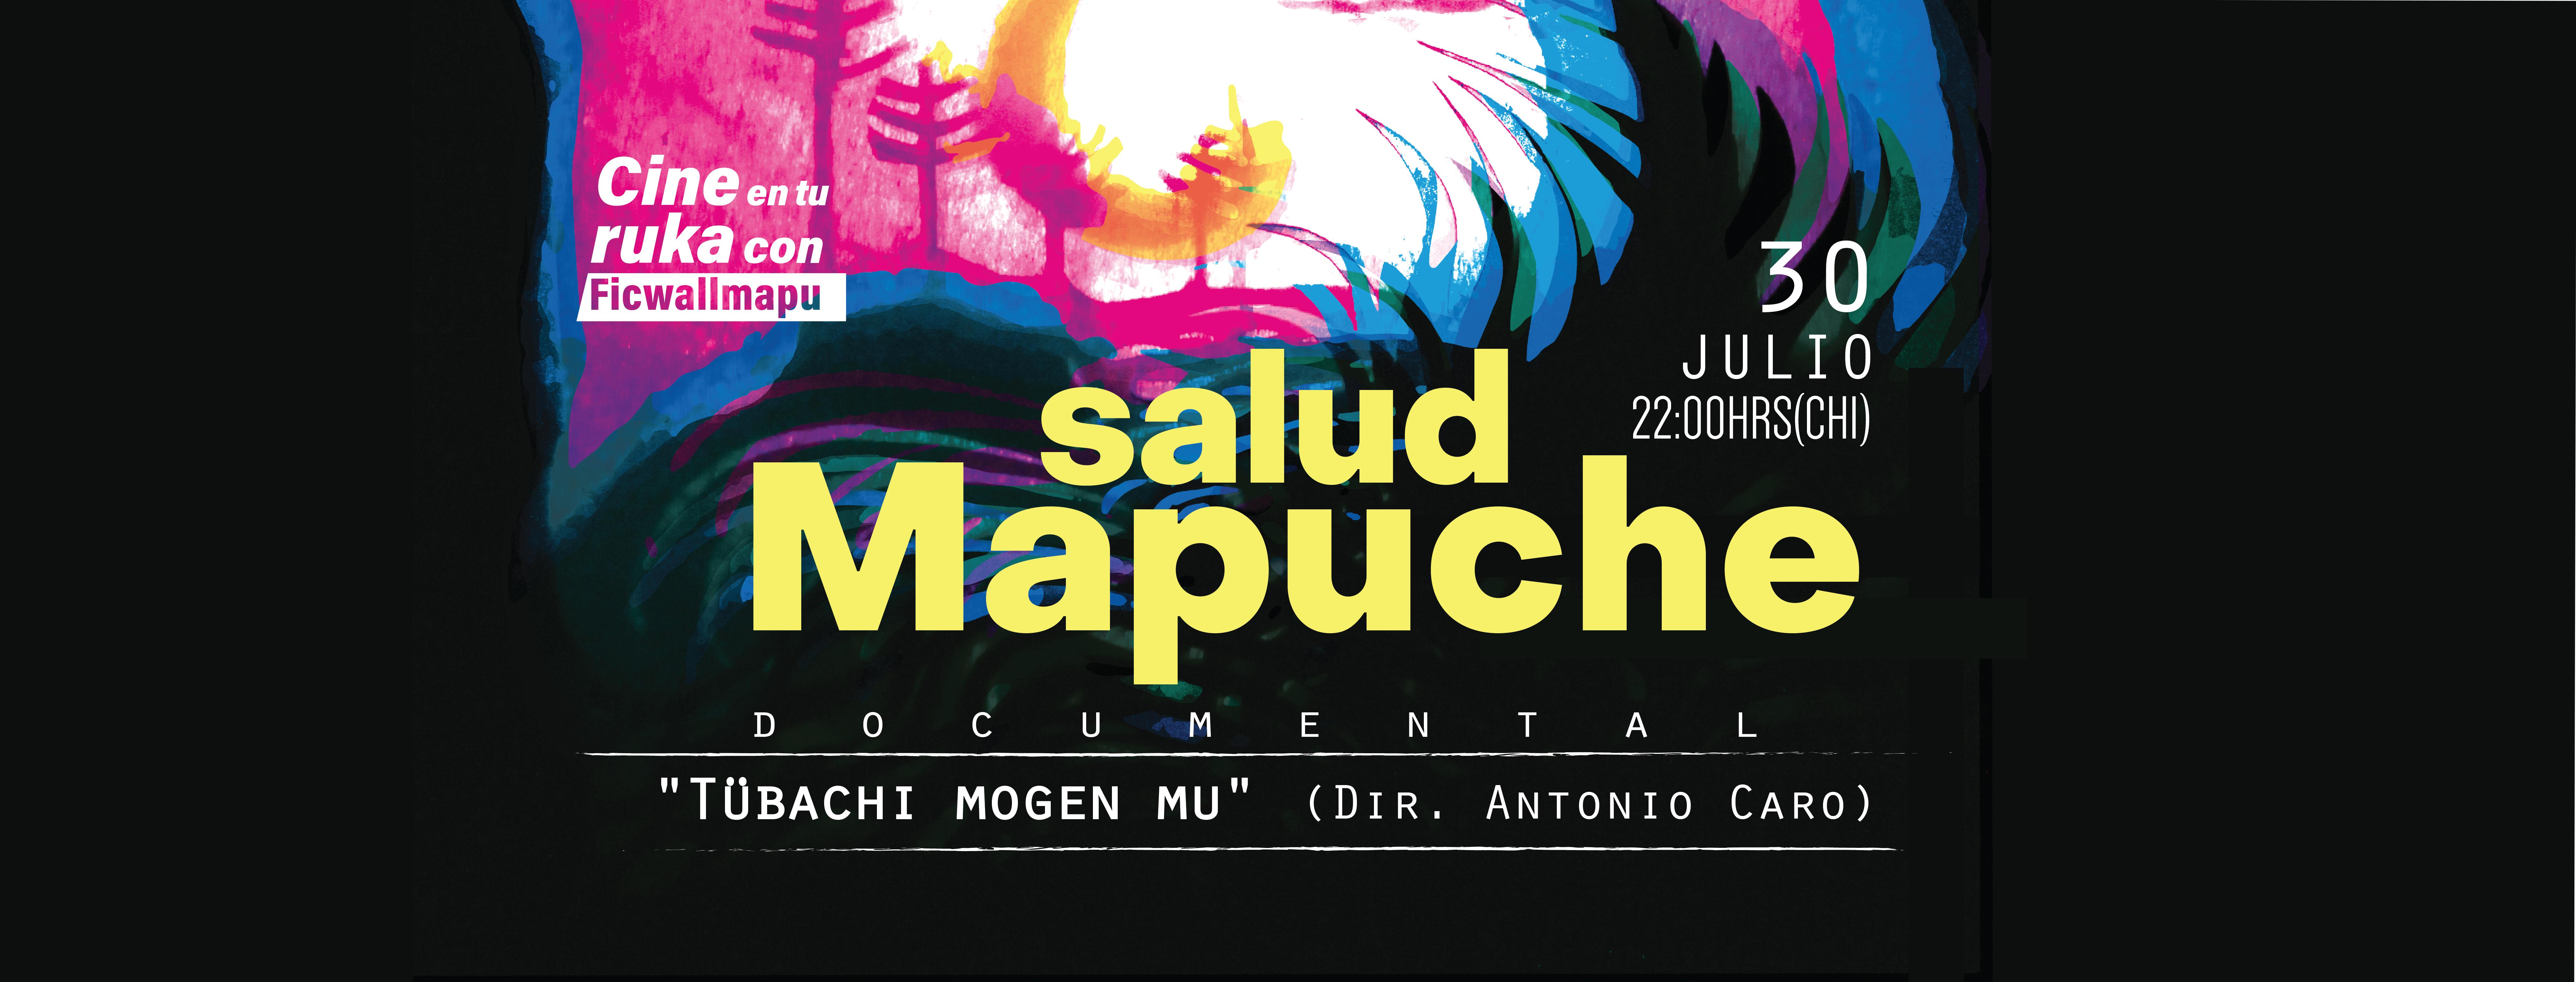 Salud mapuche